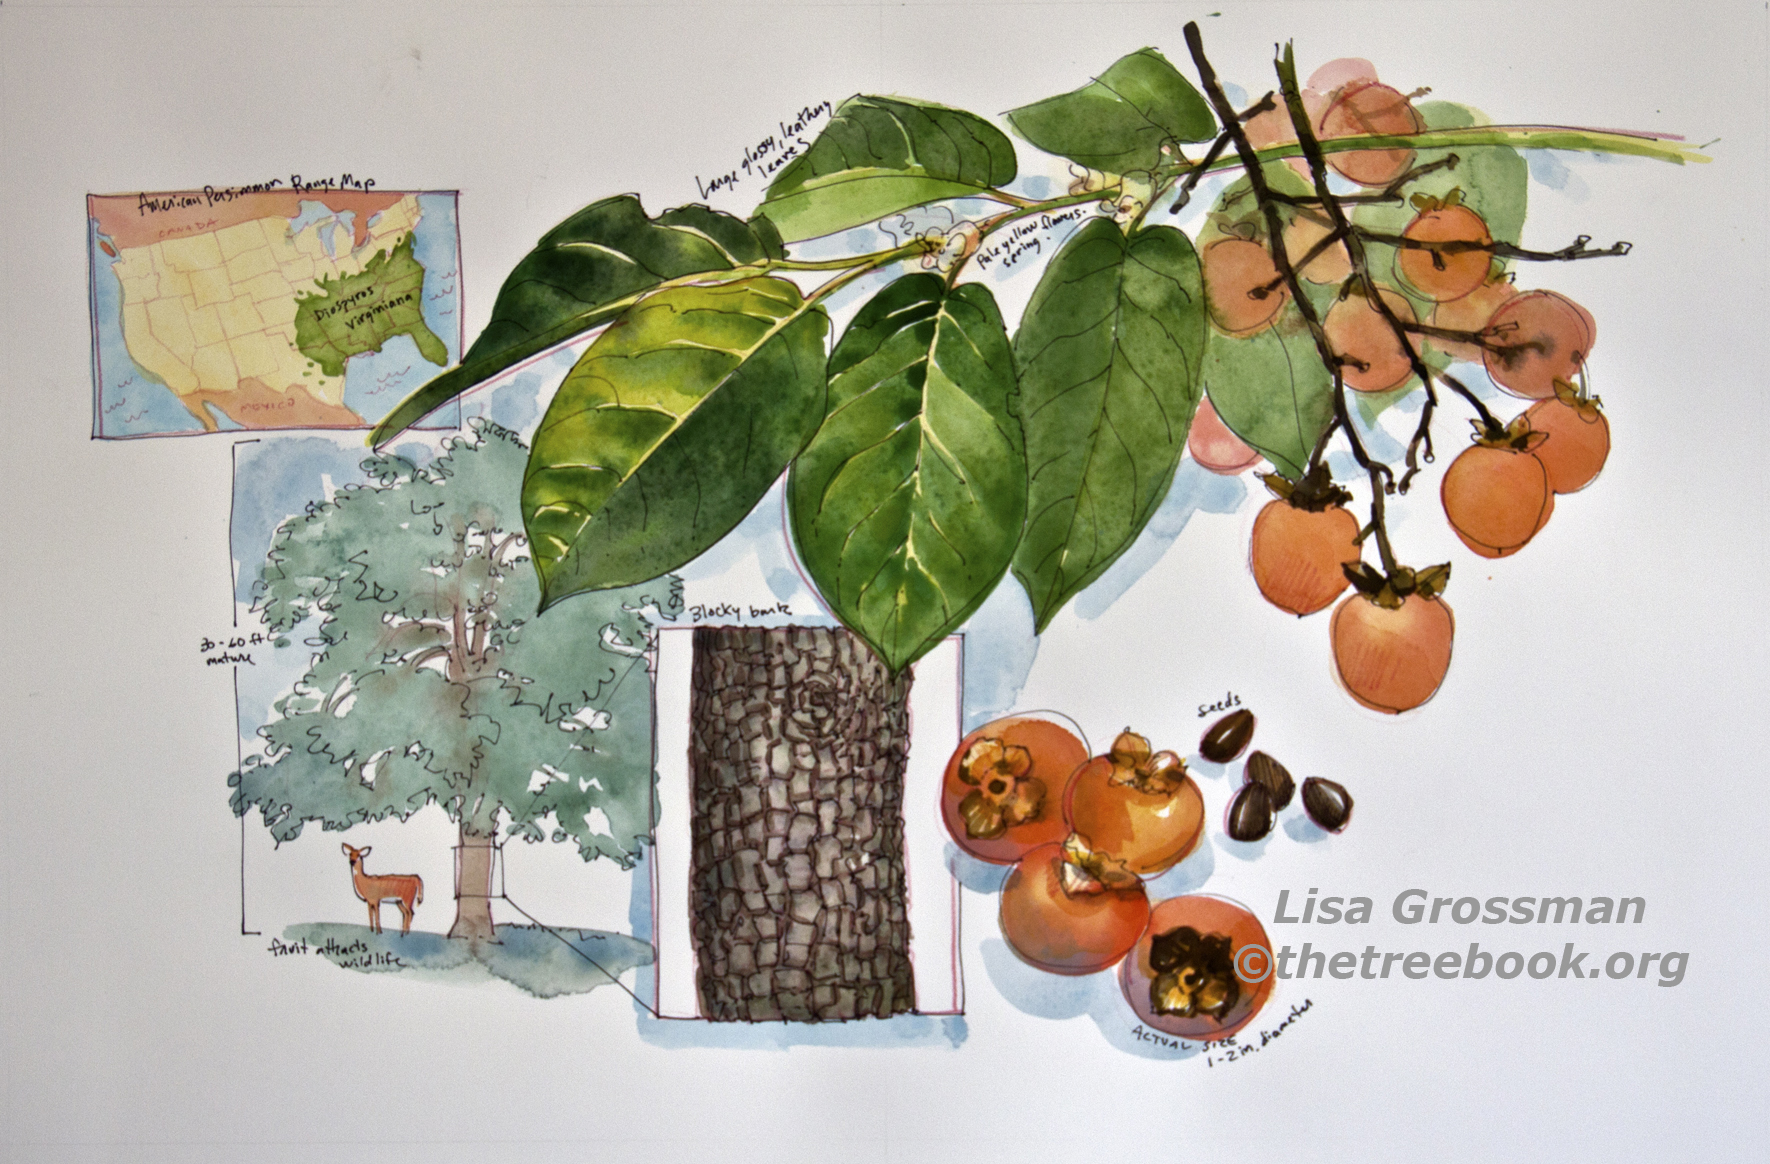 Lisa Grossman, Persimmon